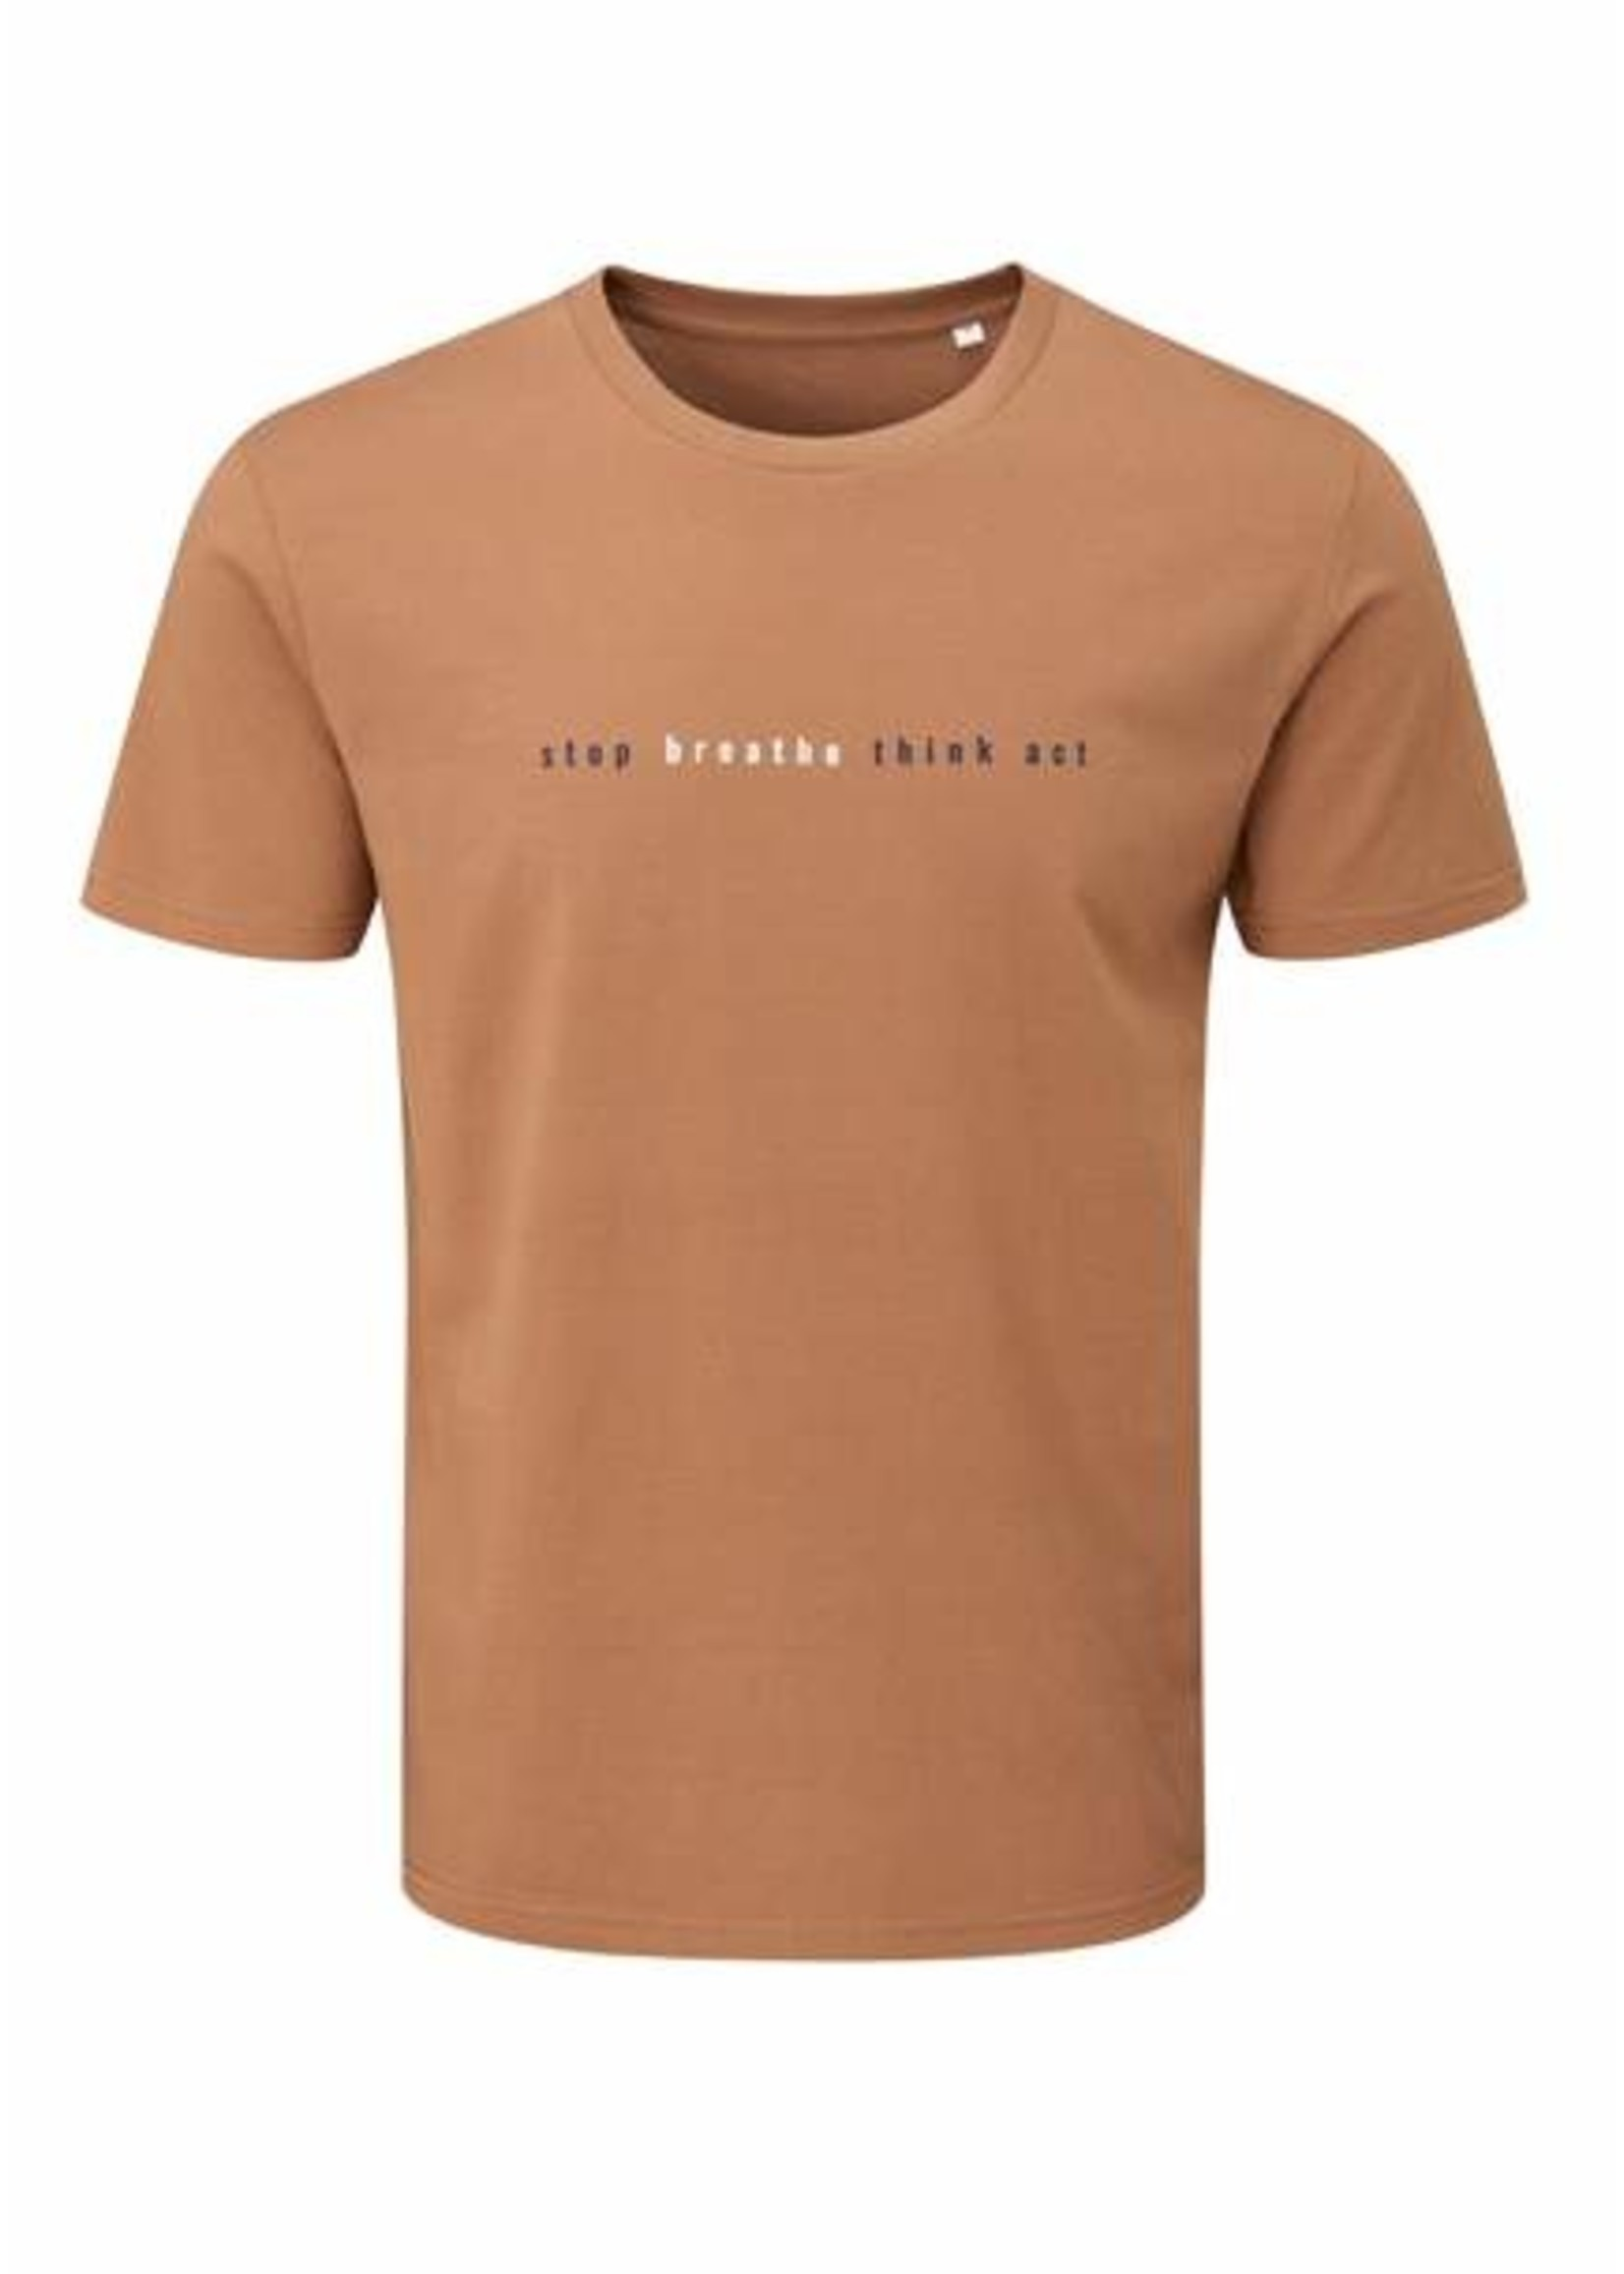 Fourth Element Fourth Element Stop Breathe Brown T-Shirt - man